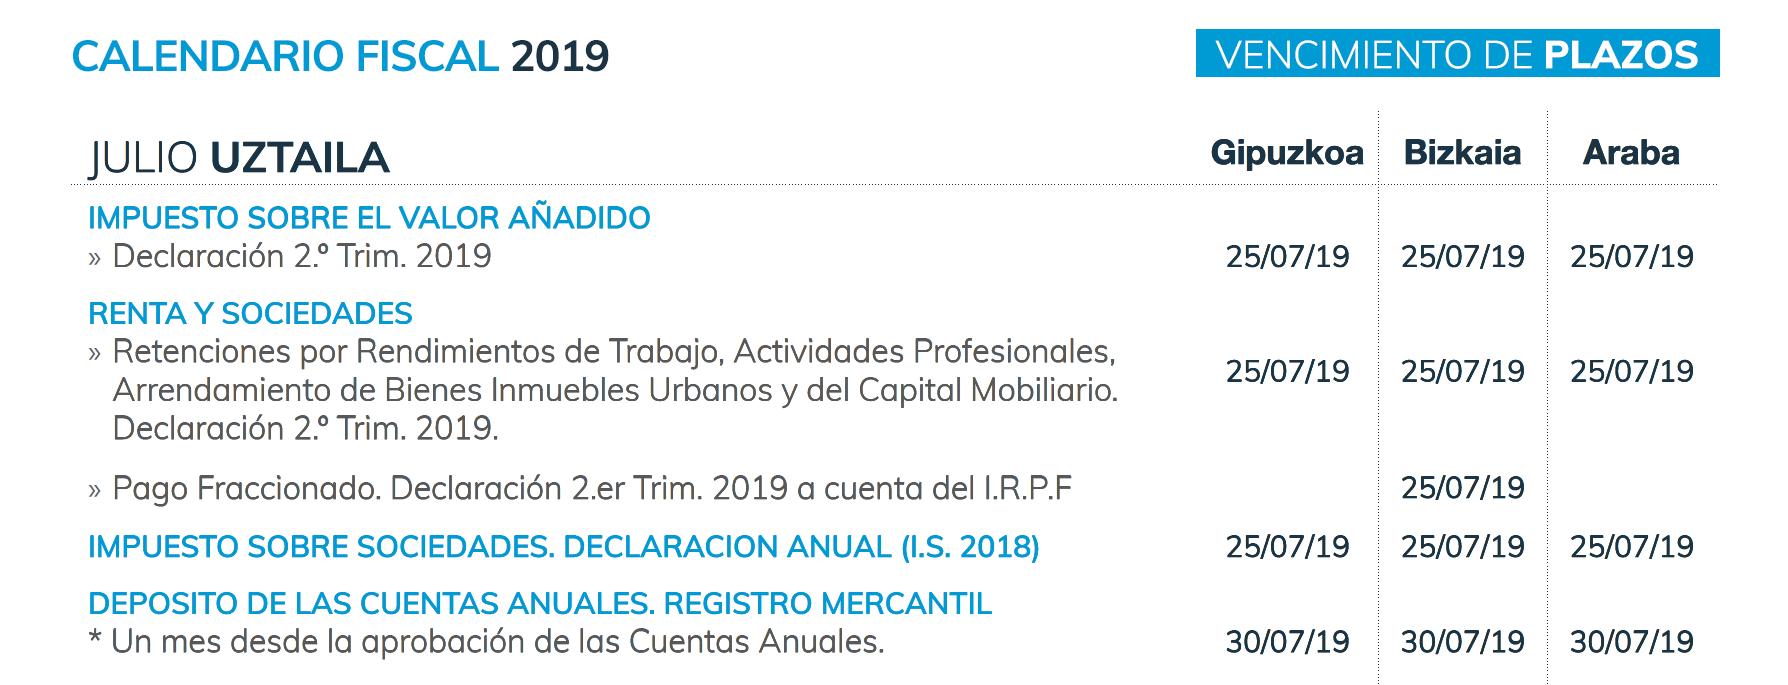 Calendario Laboral Donostia 2019.Calendario Fiscal Segundo Semestre Del 2019 Sayma